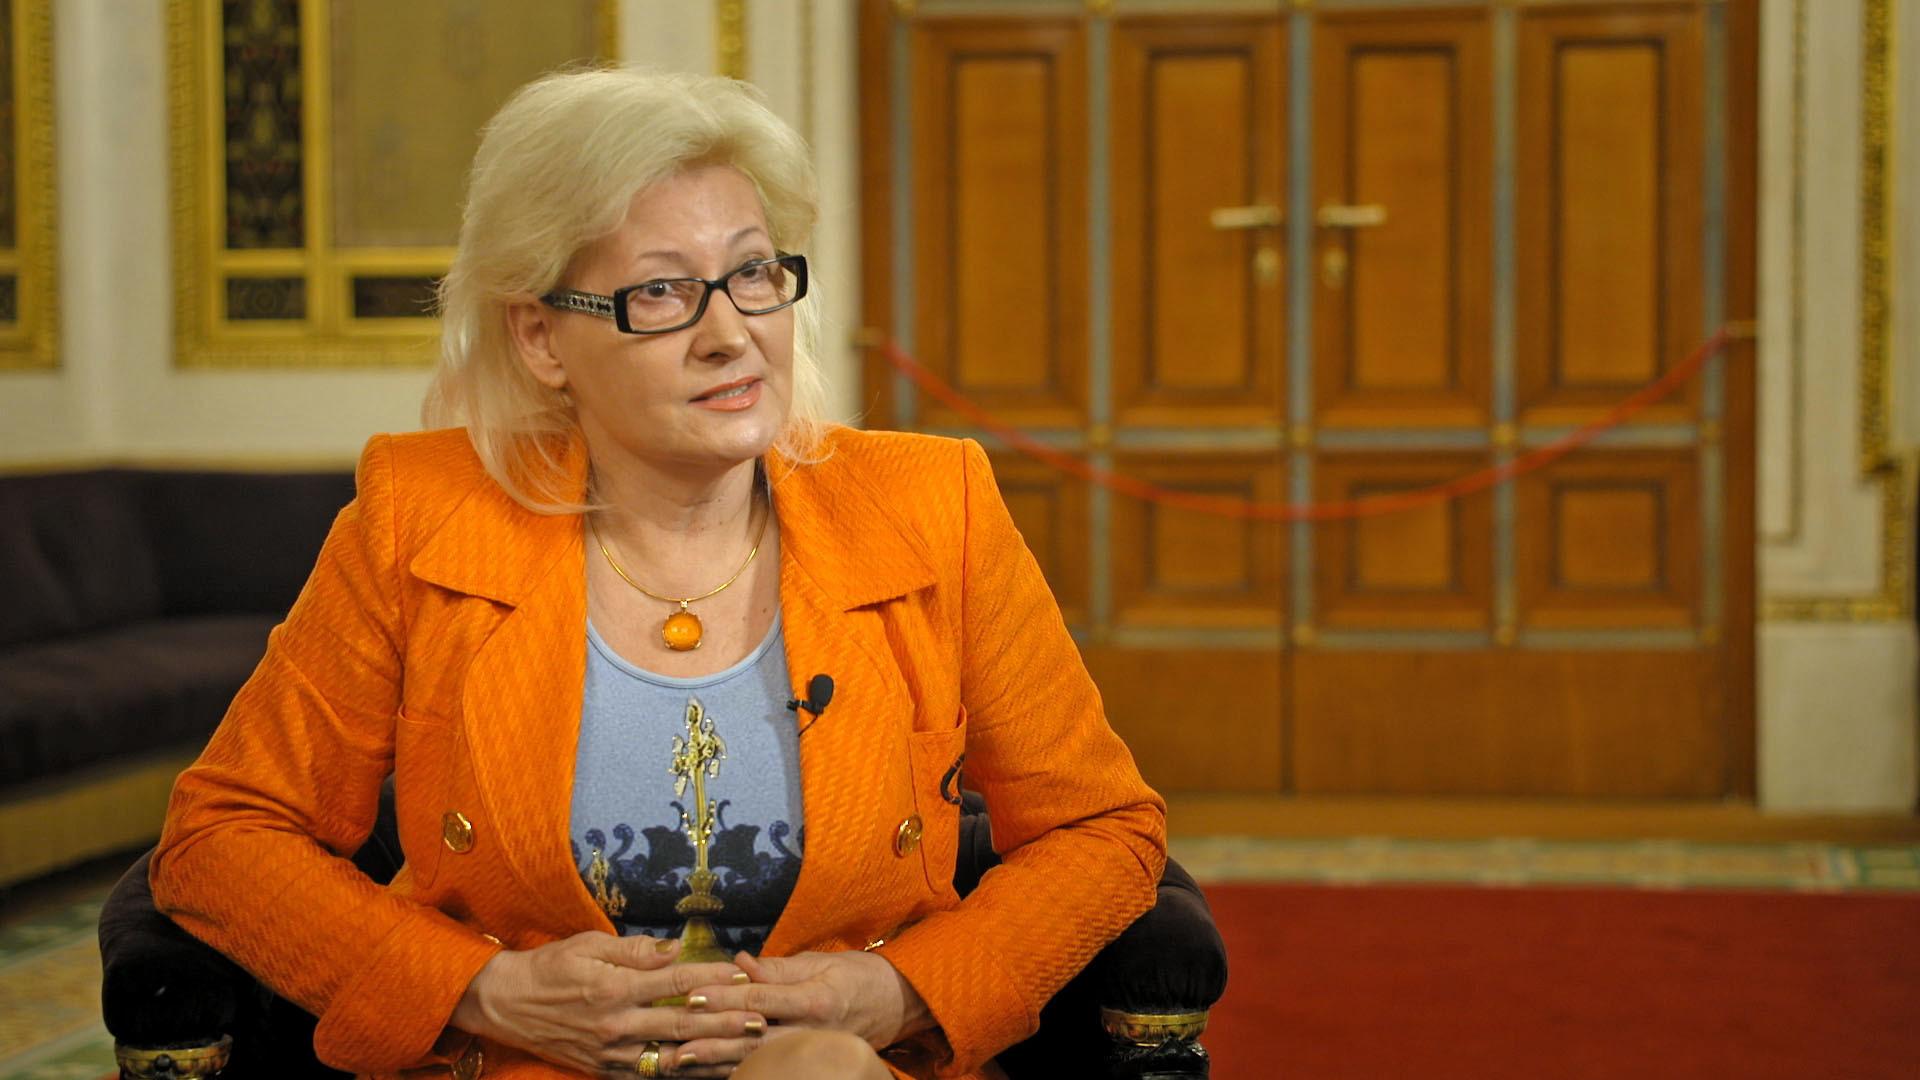 Barbara-Dmytrasz-Historikerin